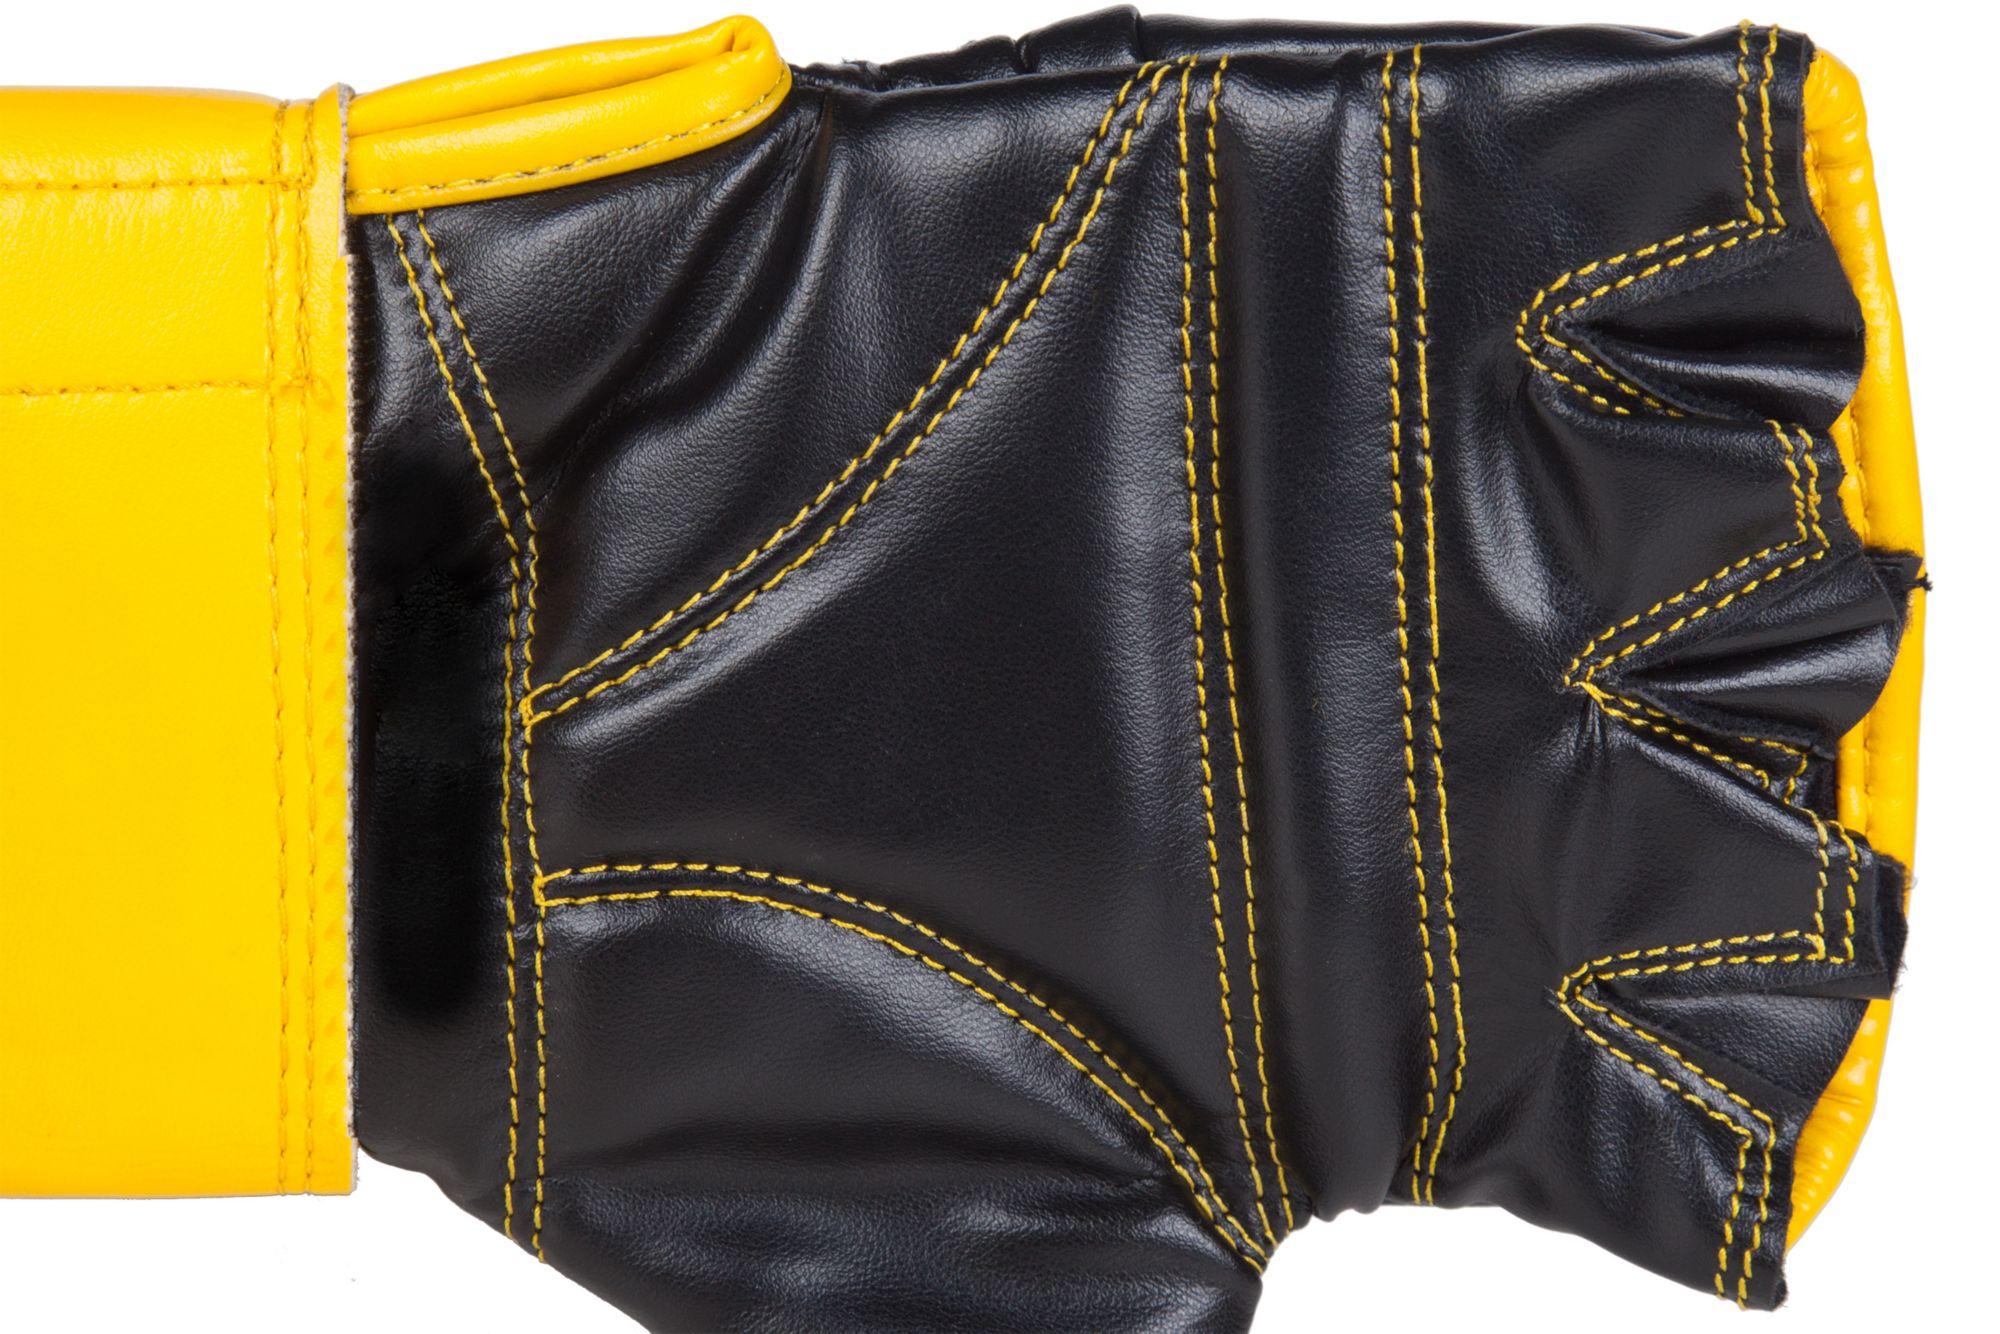 BENLEE ROCKY MARCIANO Benlee Rocky Marciano Accessoires »POWER HAND LIGHT«